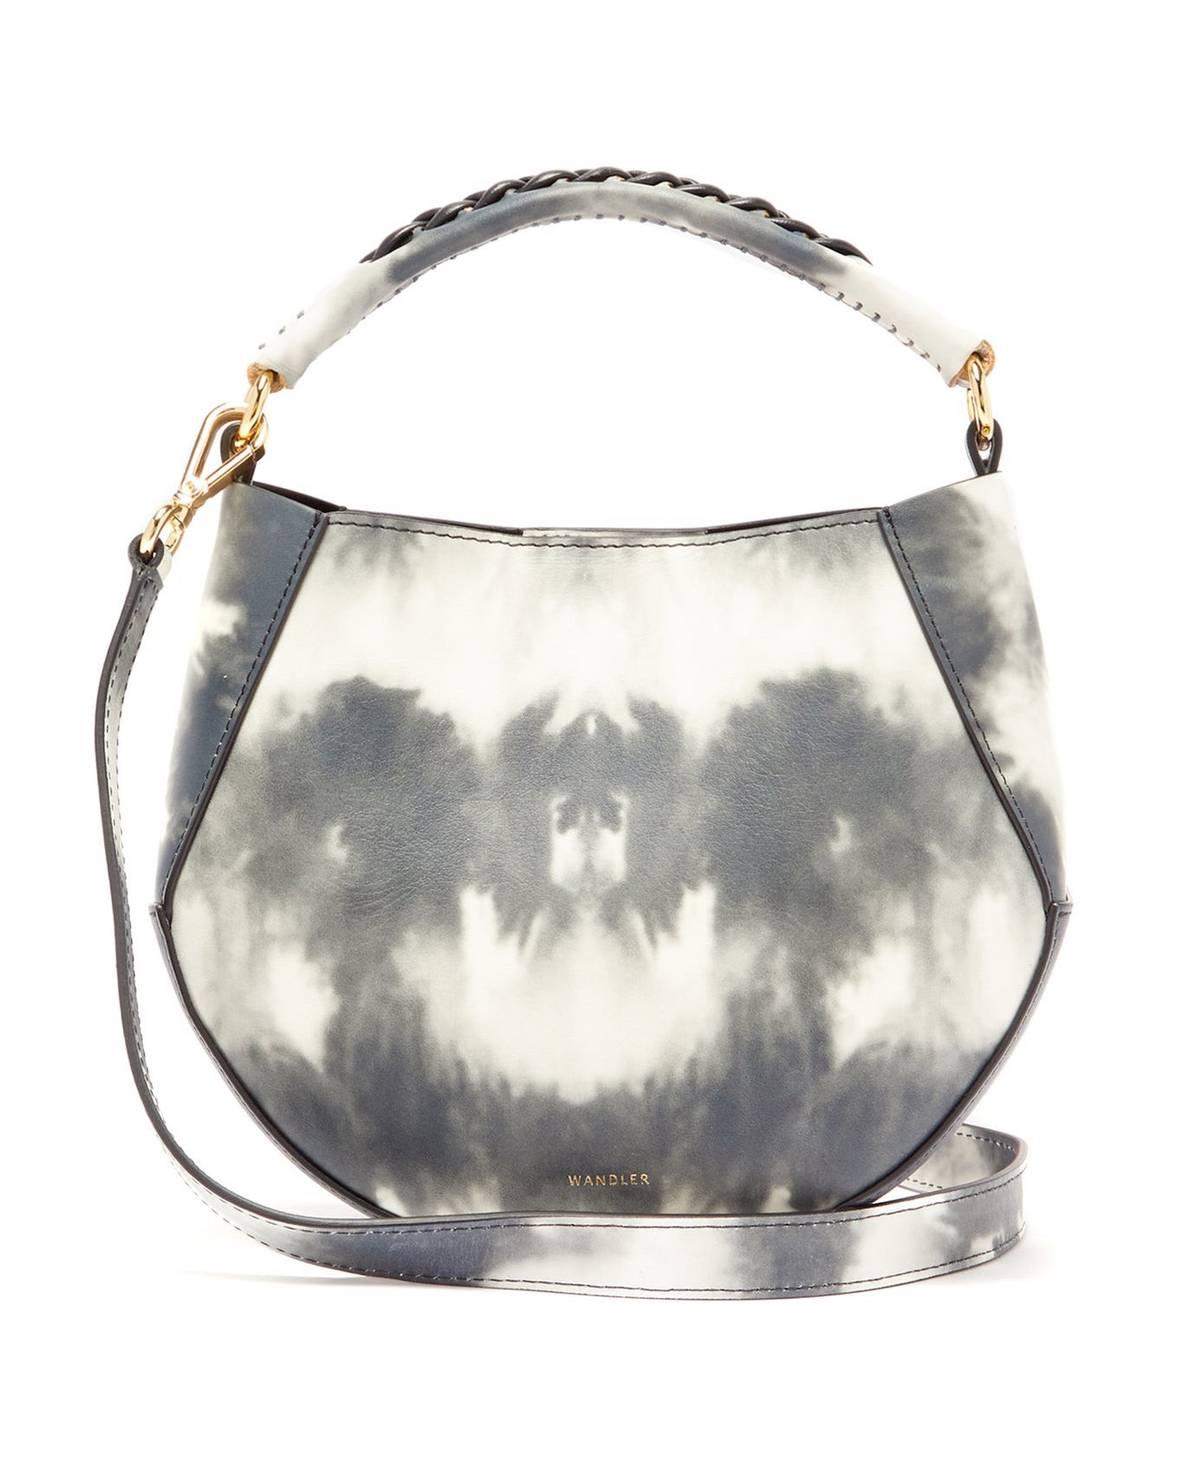 wandler-mini tiedye leather bag